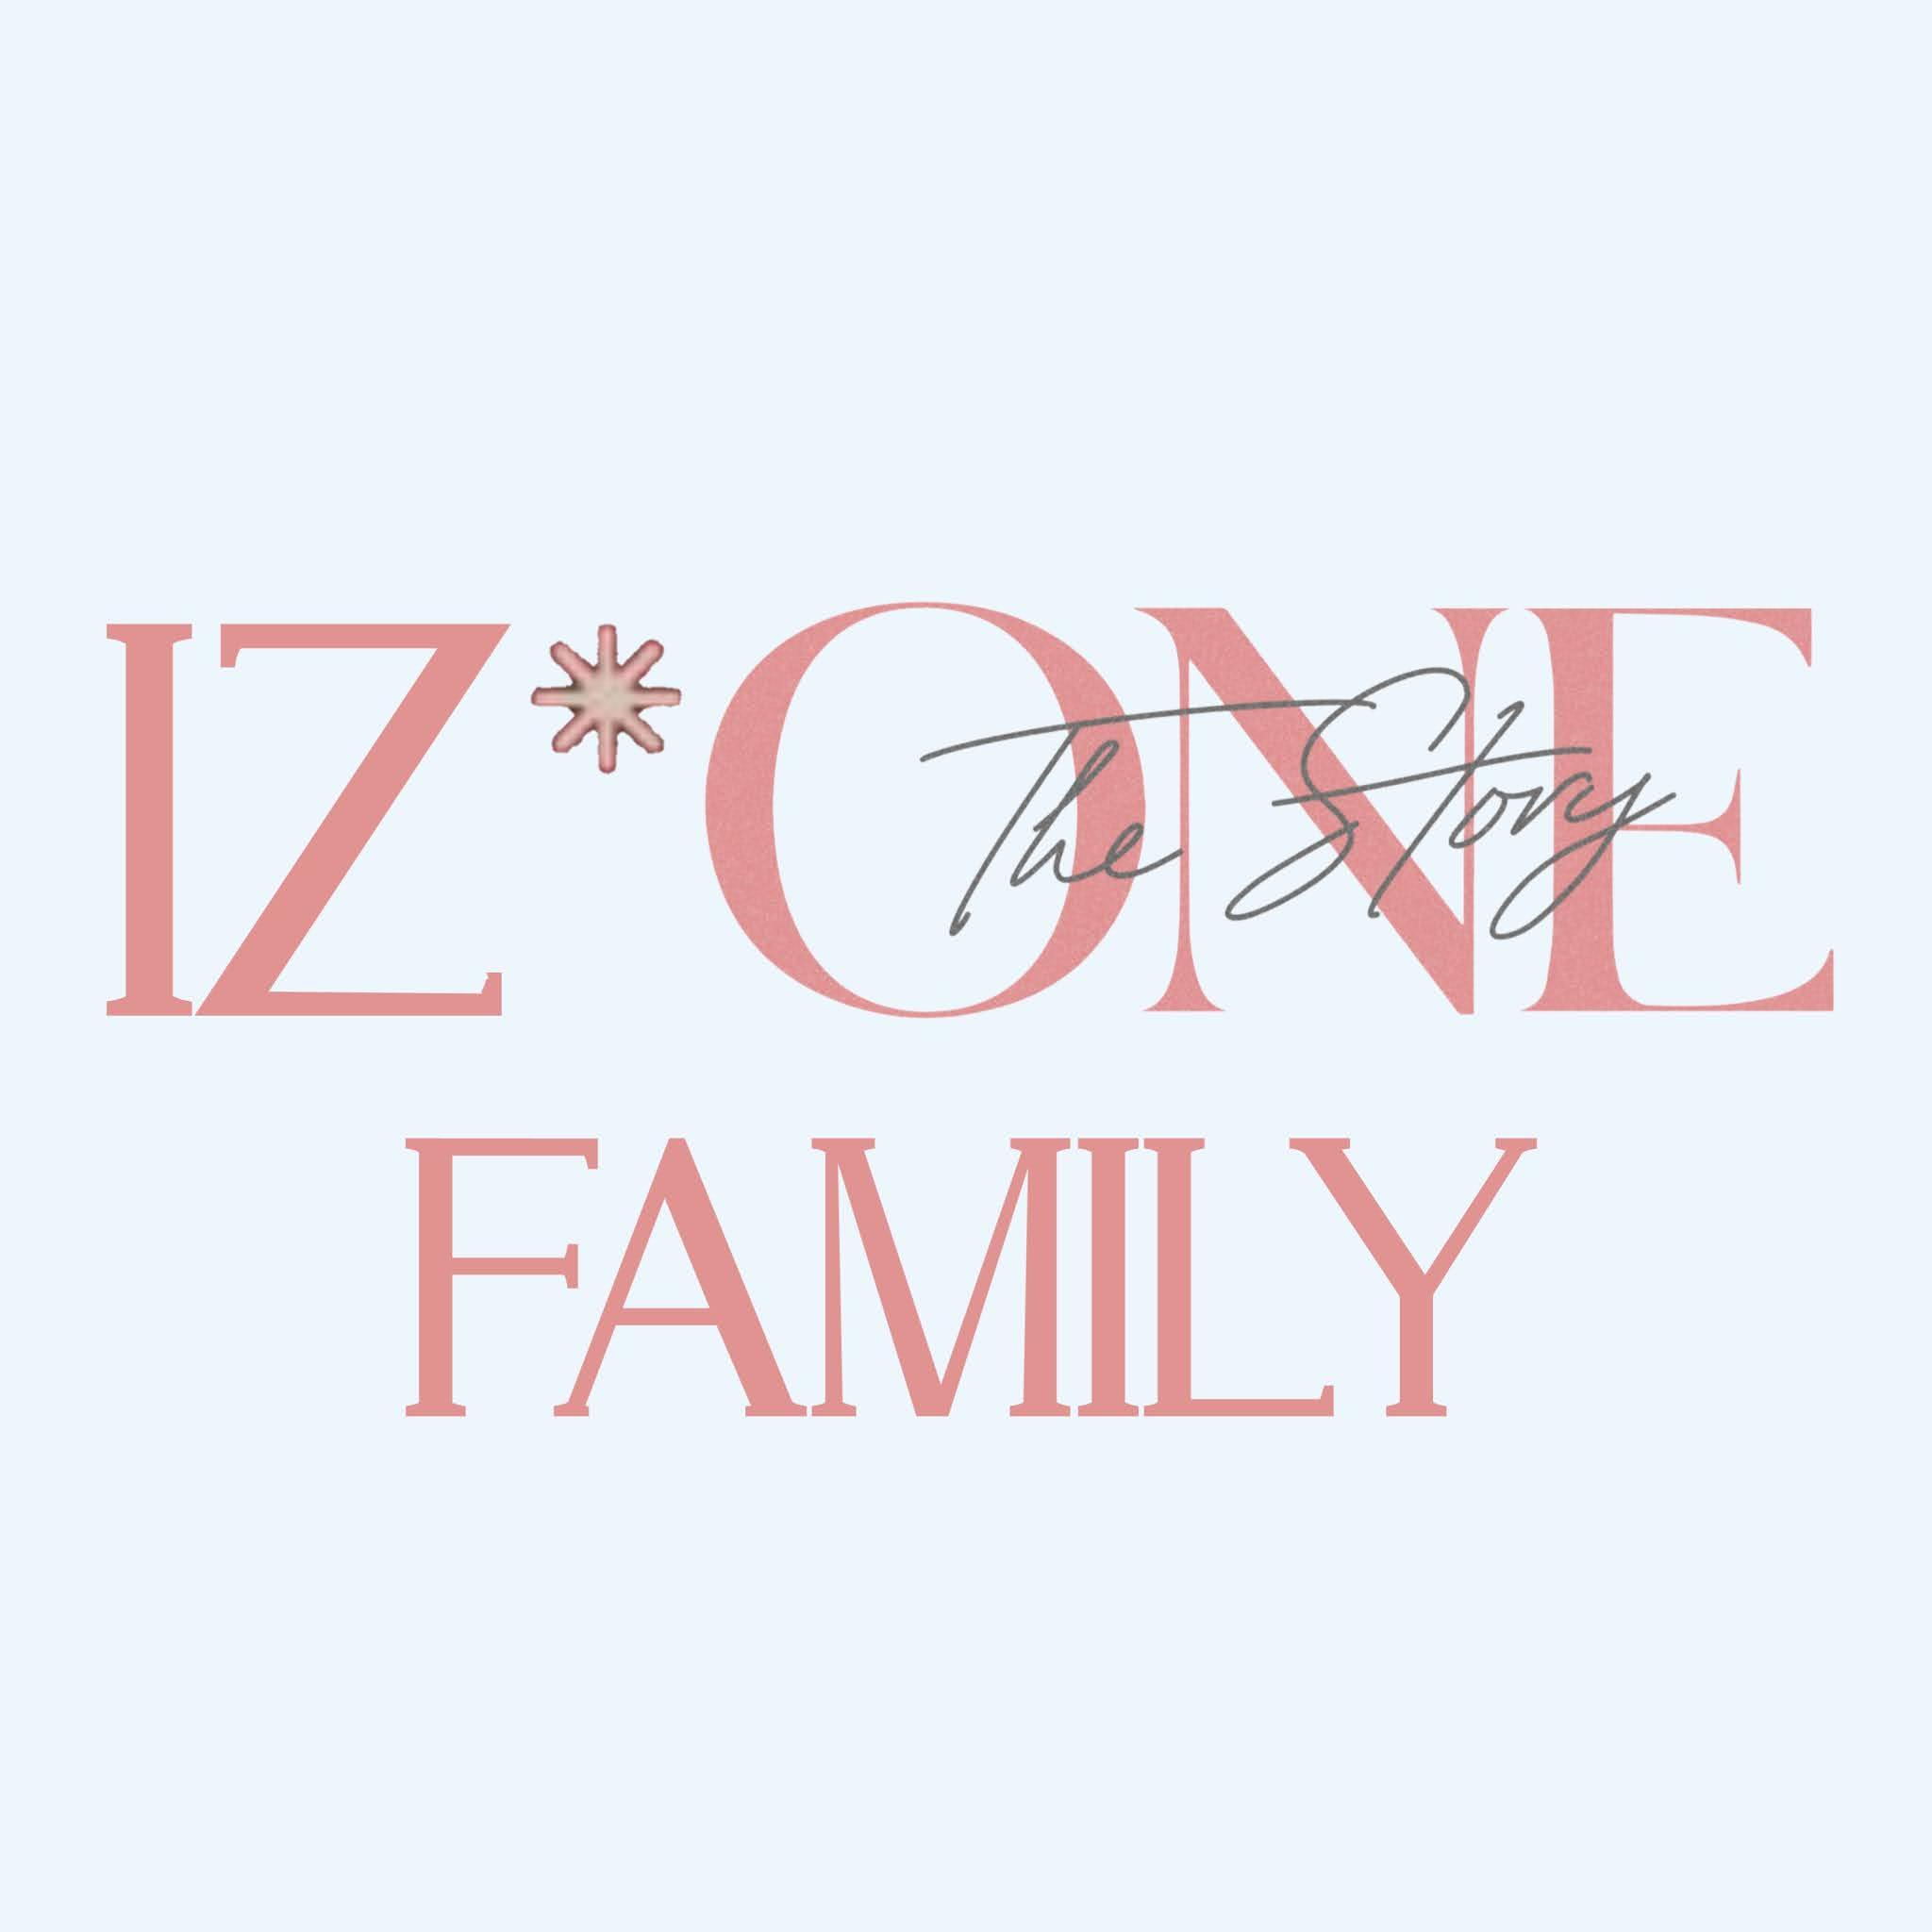 IZ*ONE FAMILY